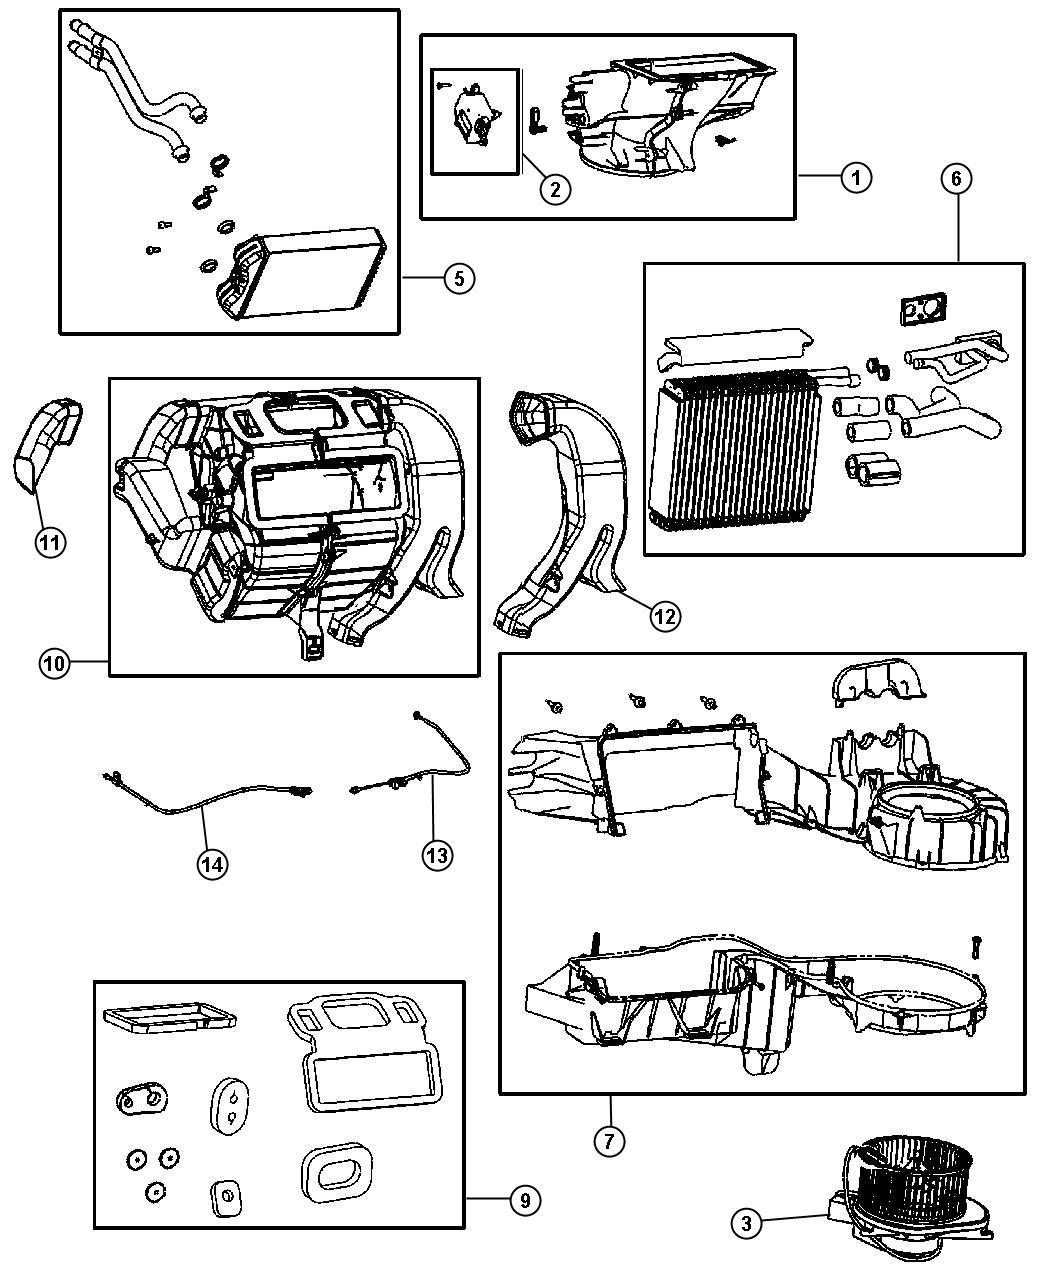 2009 Chrysler PT Cruiser Evaporator. Air conditioning